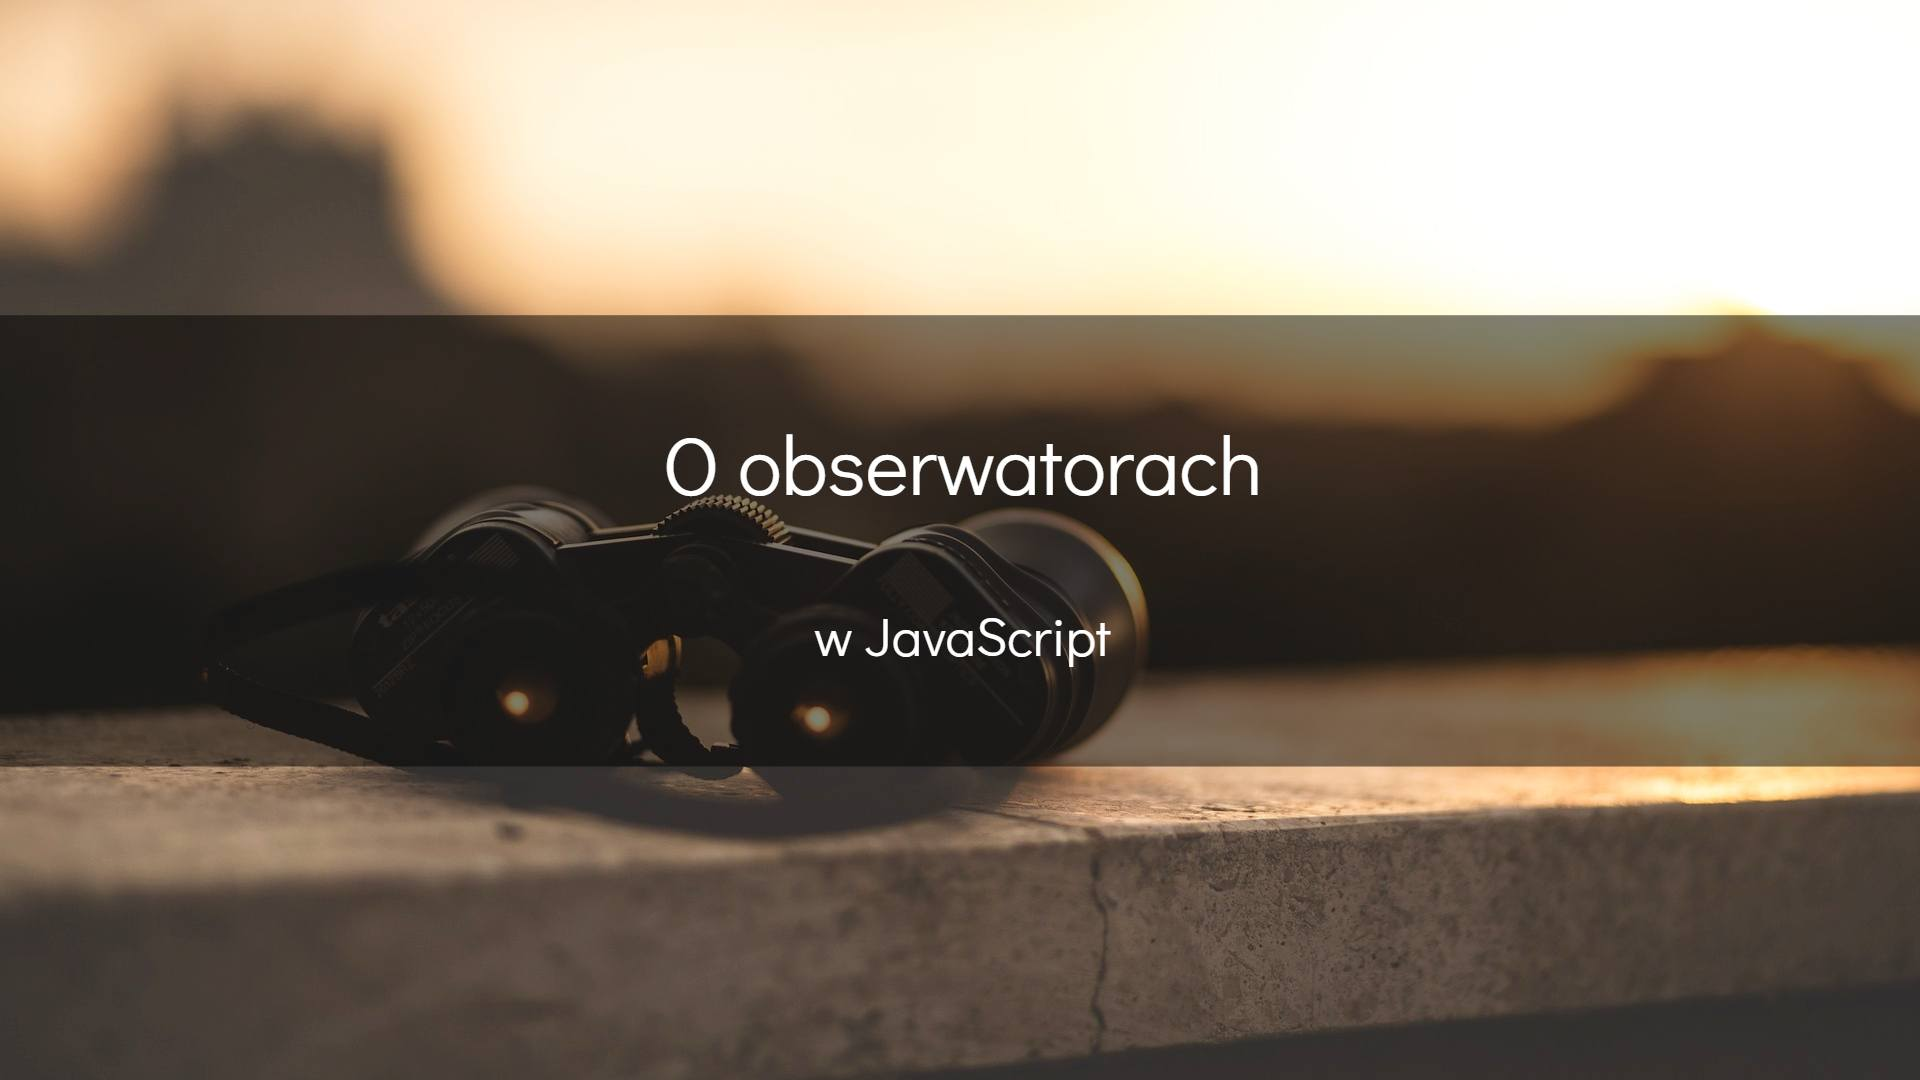 Oobserwatorach wJavaScript